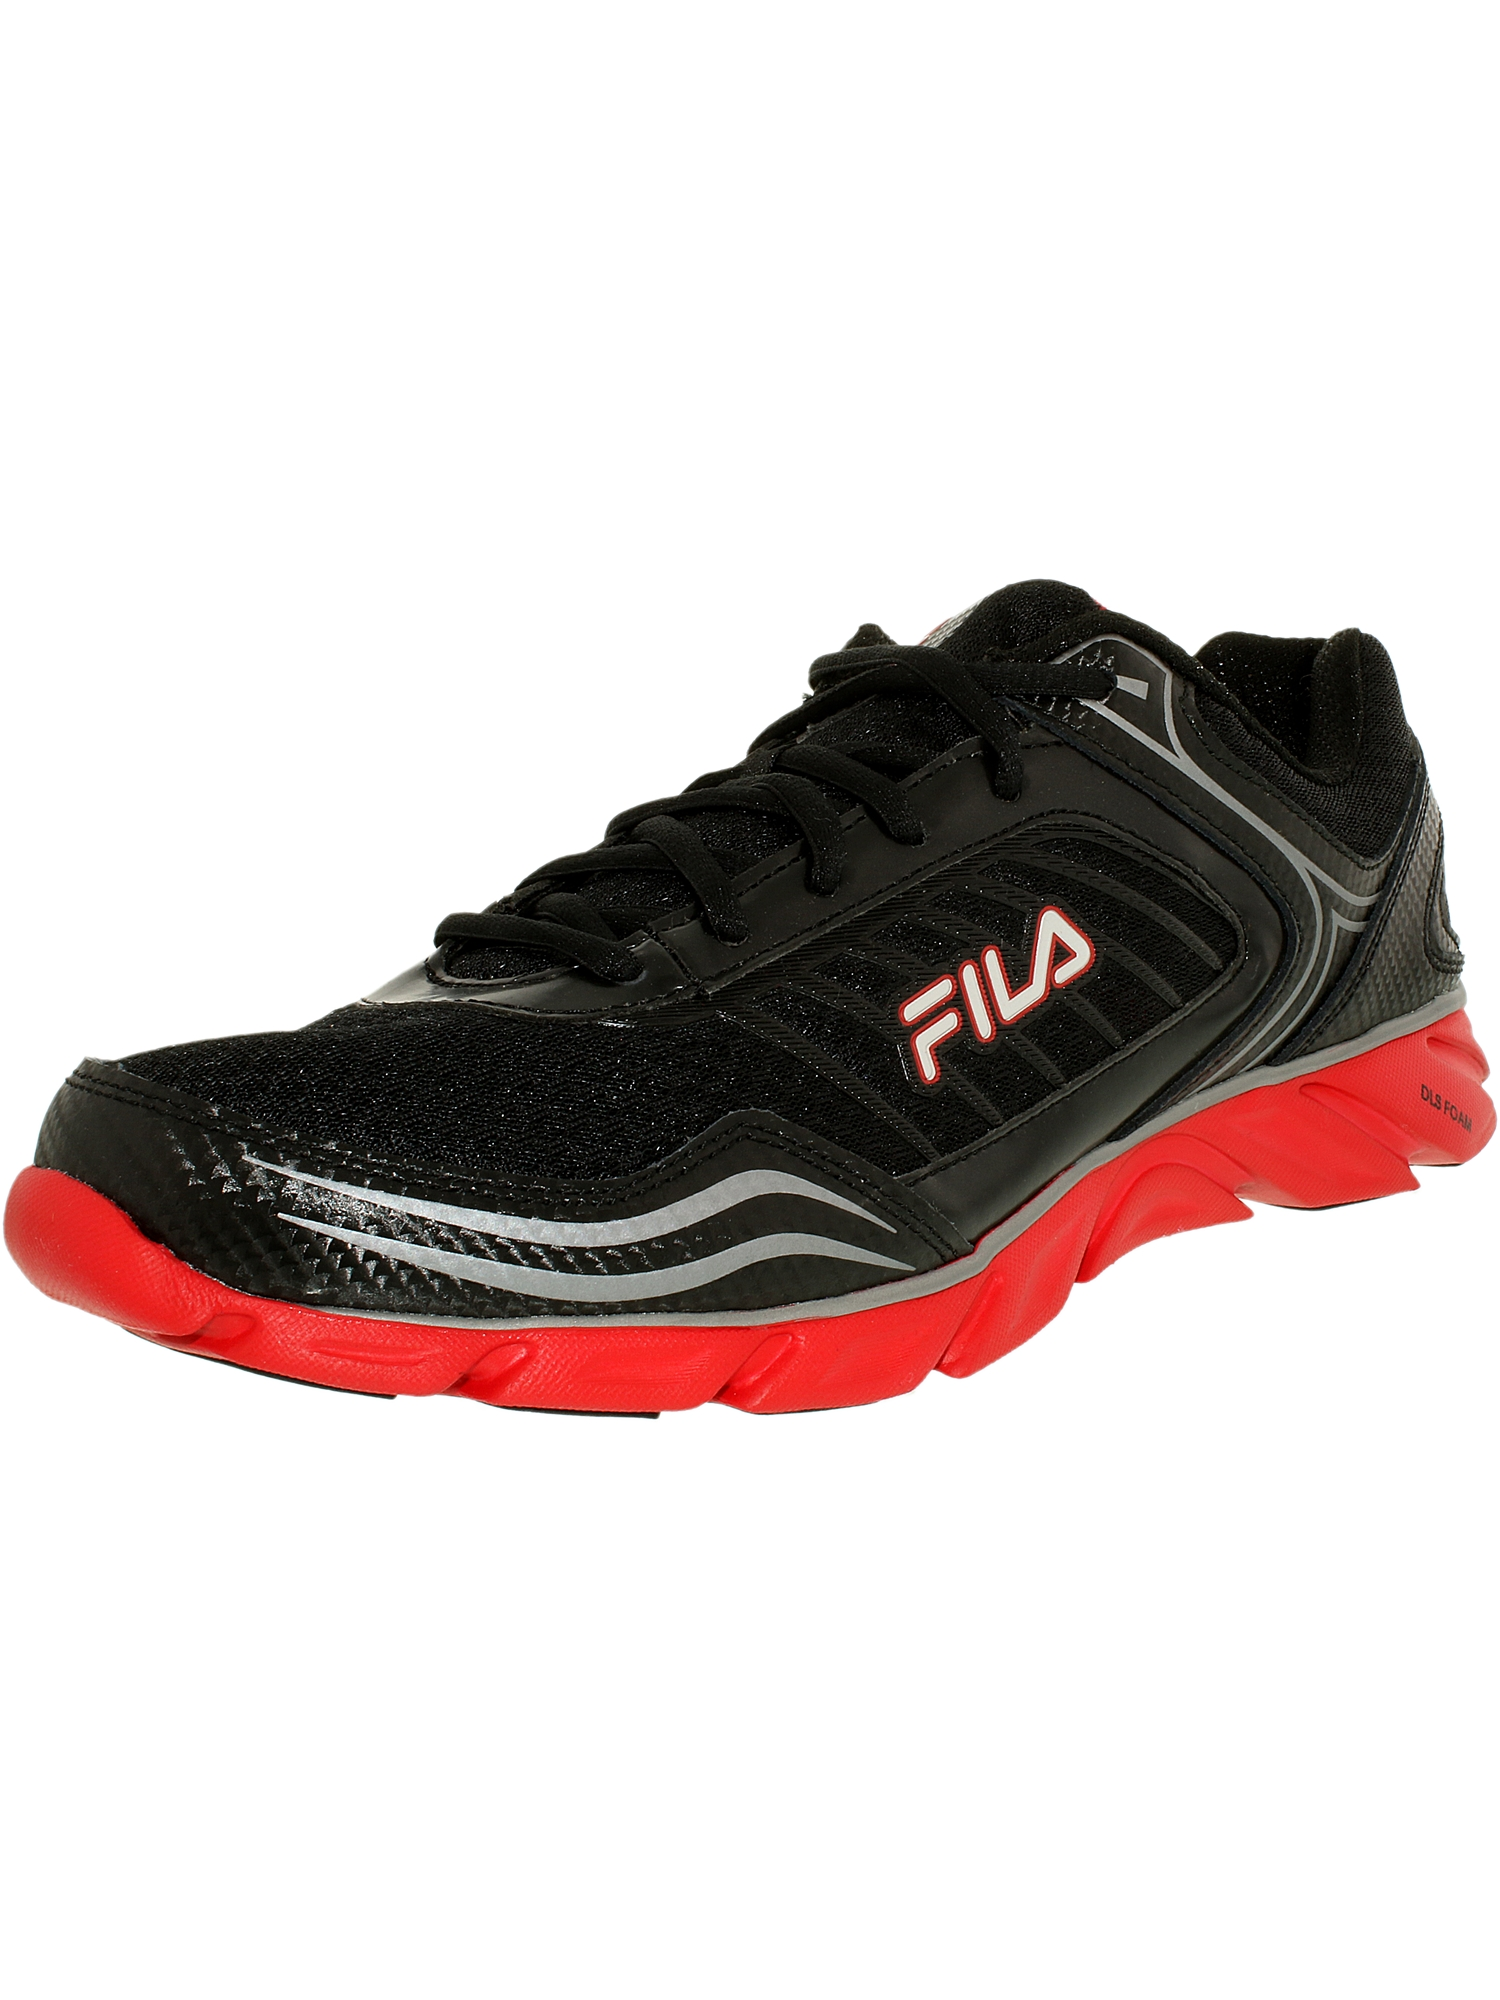 Fila Men's Memory Fresh 2 Black/Fila Red/Metallic Silver Ankle-High Running Shoe - 10M